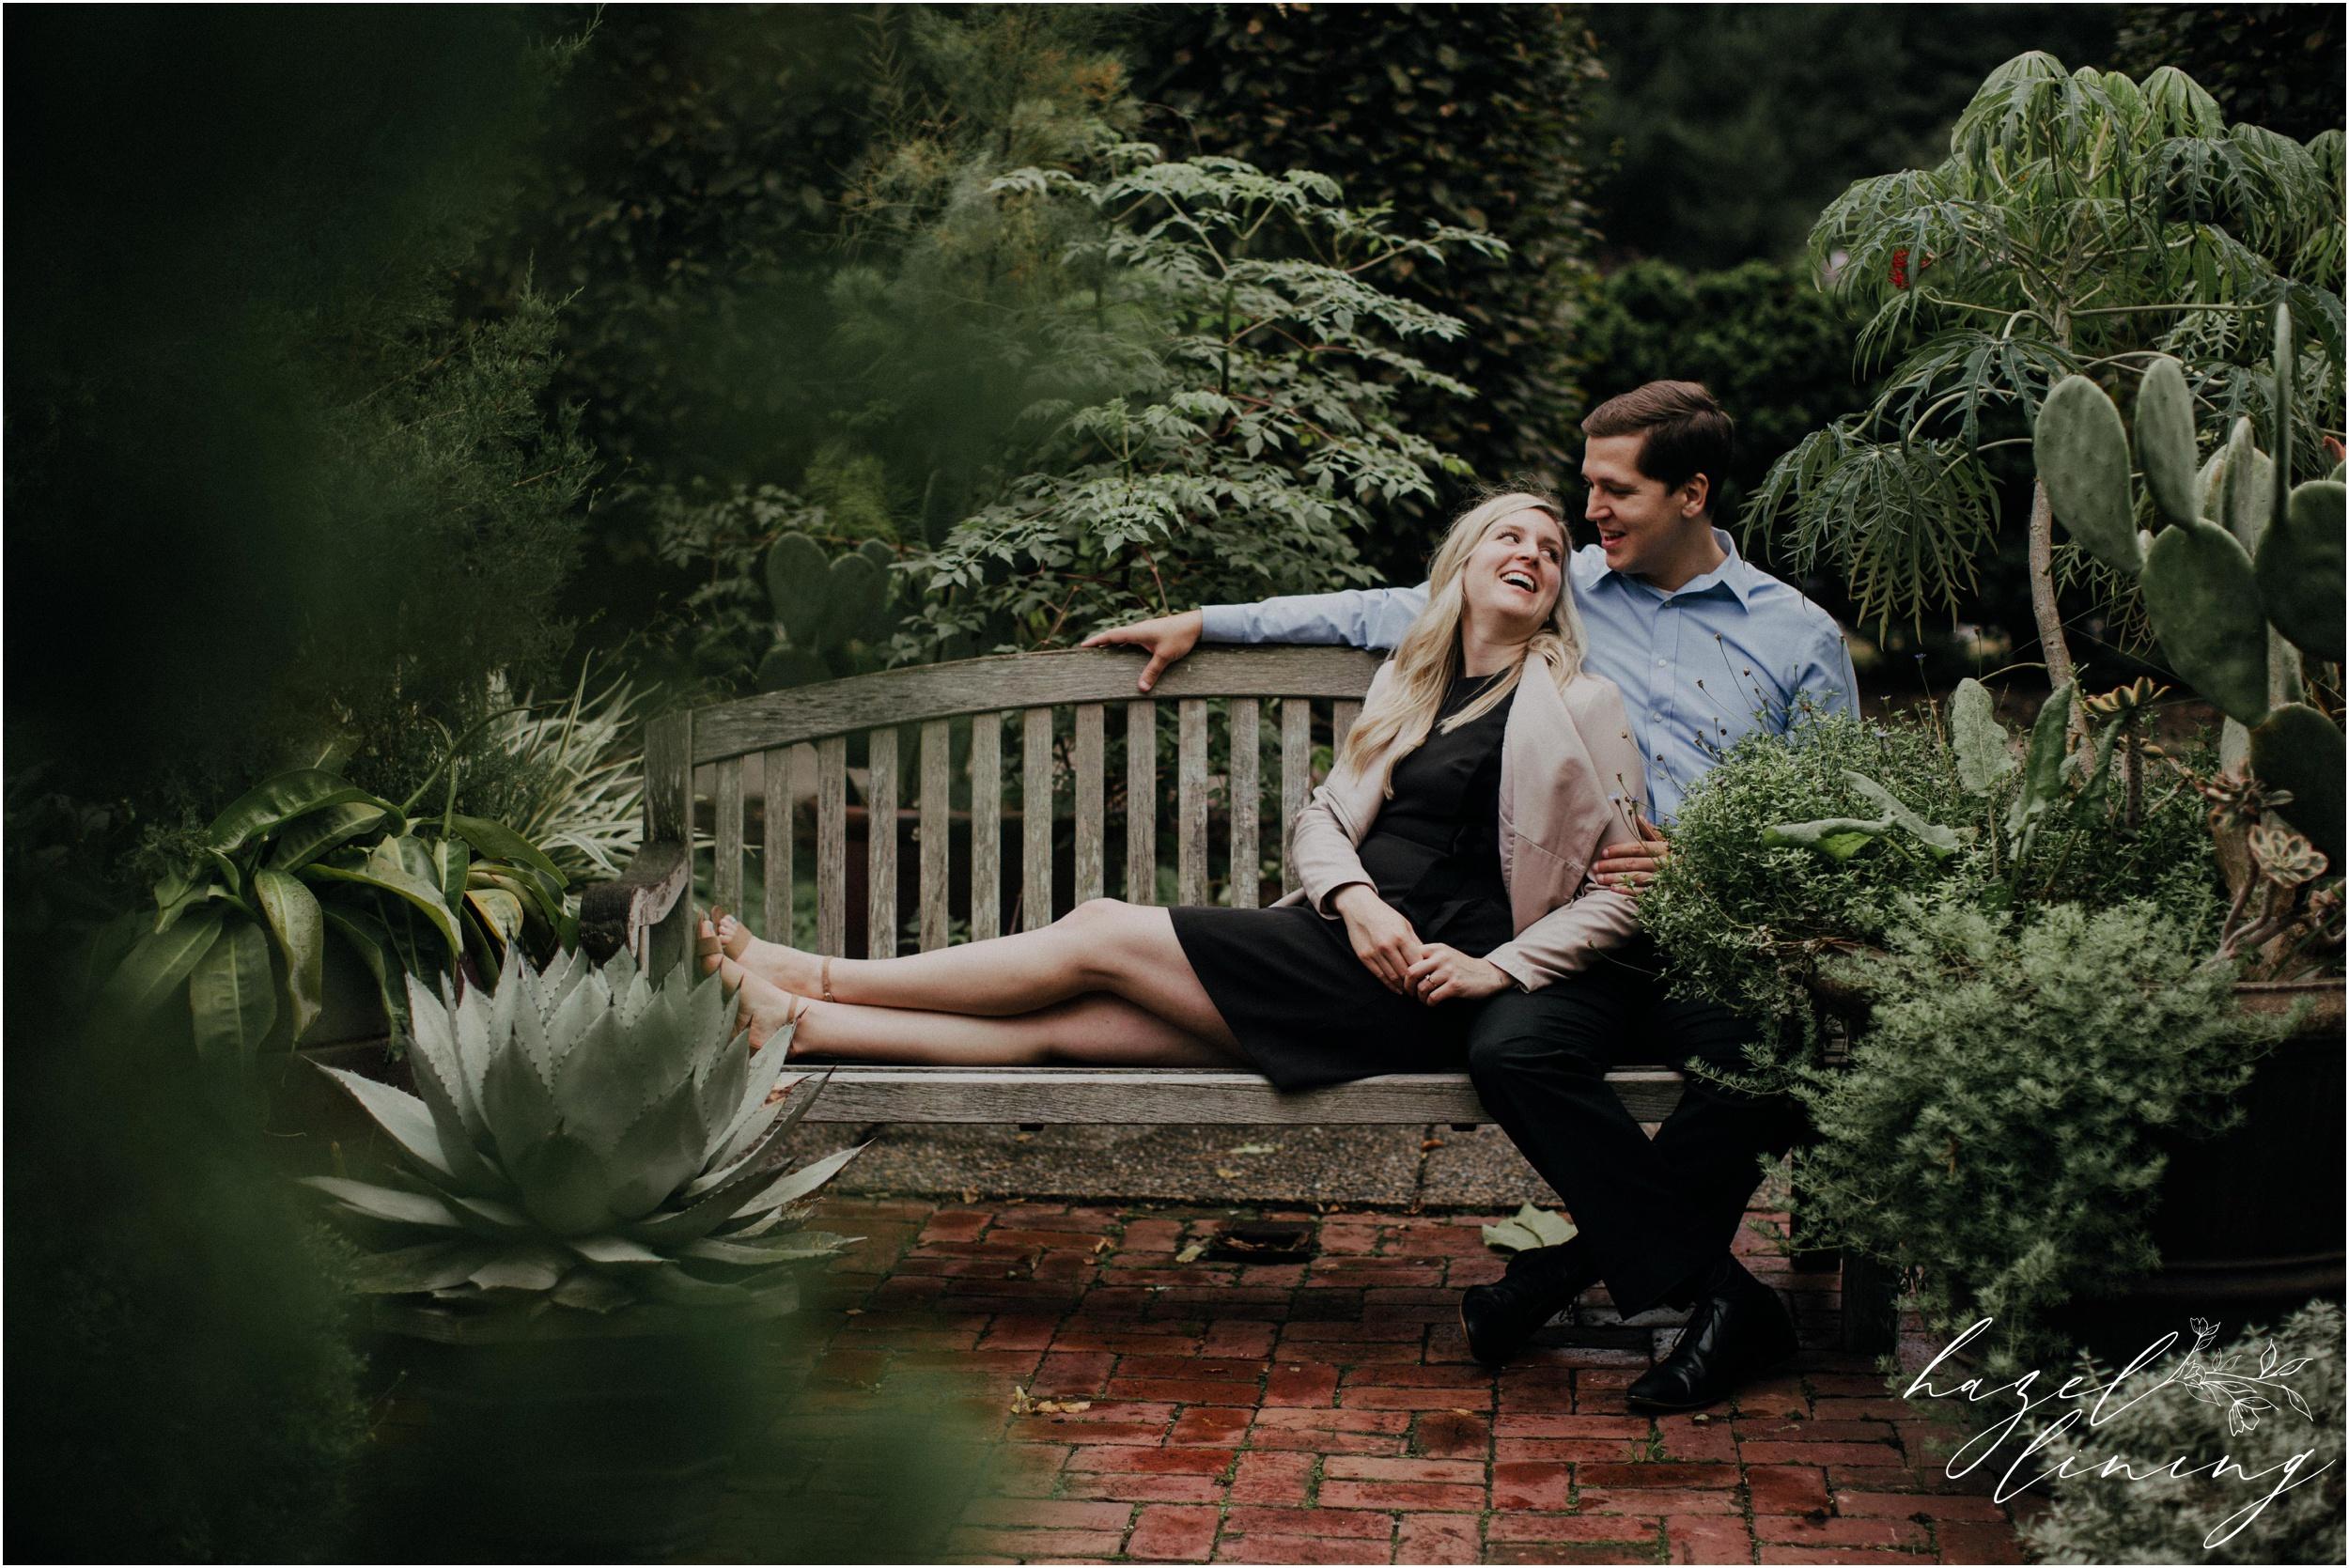 victoria-travis-logan-mayes-longwood-gardens-kennett-square-philadelphia-engagement-session-hazel-lining-photography-destination-elopement-wedding-engagement-photography_0032.jpg